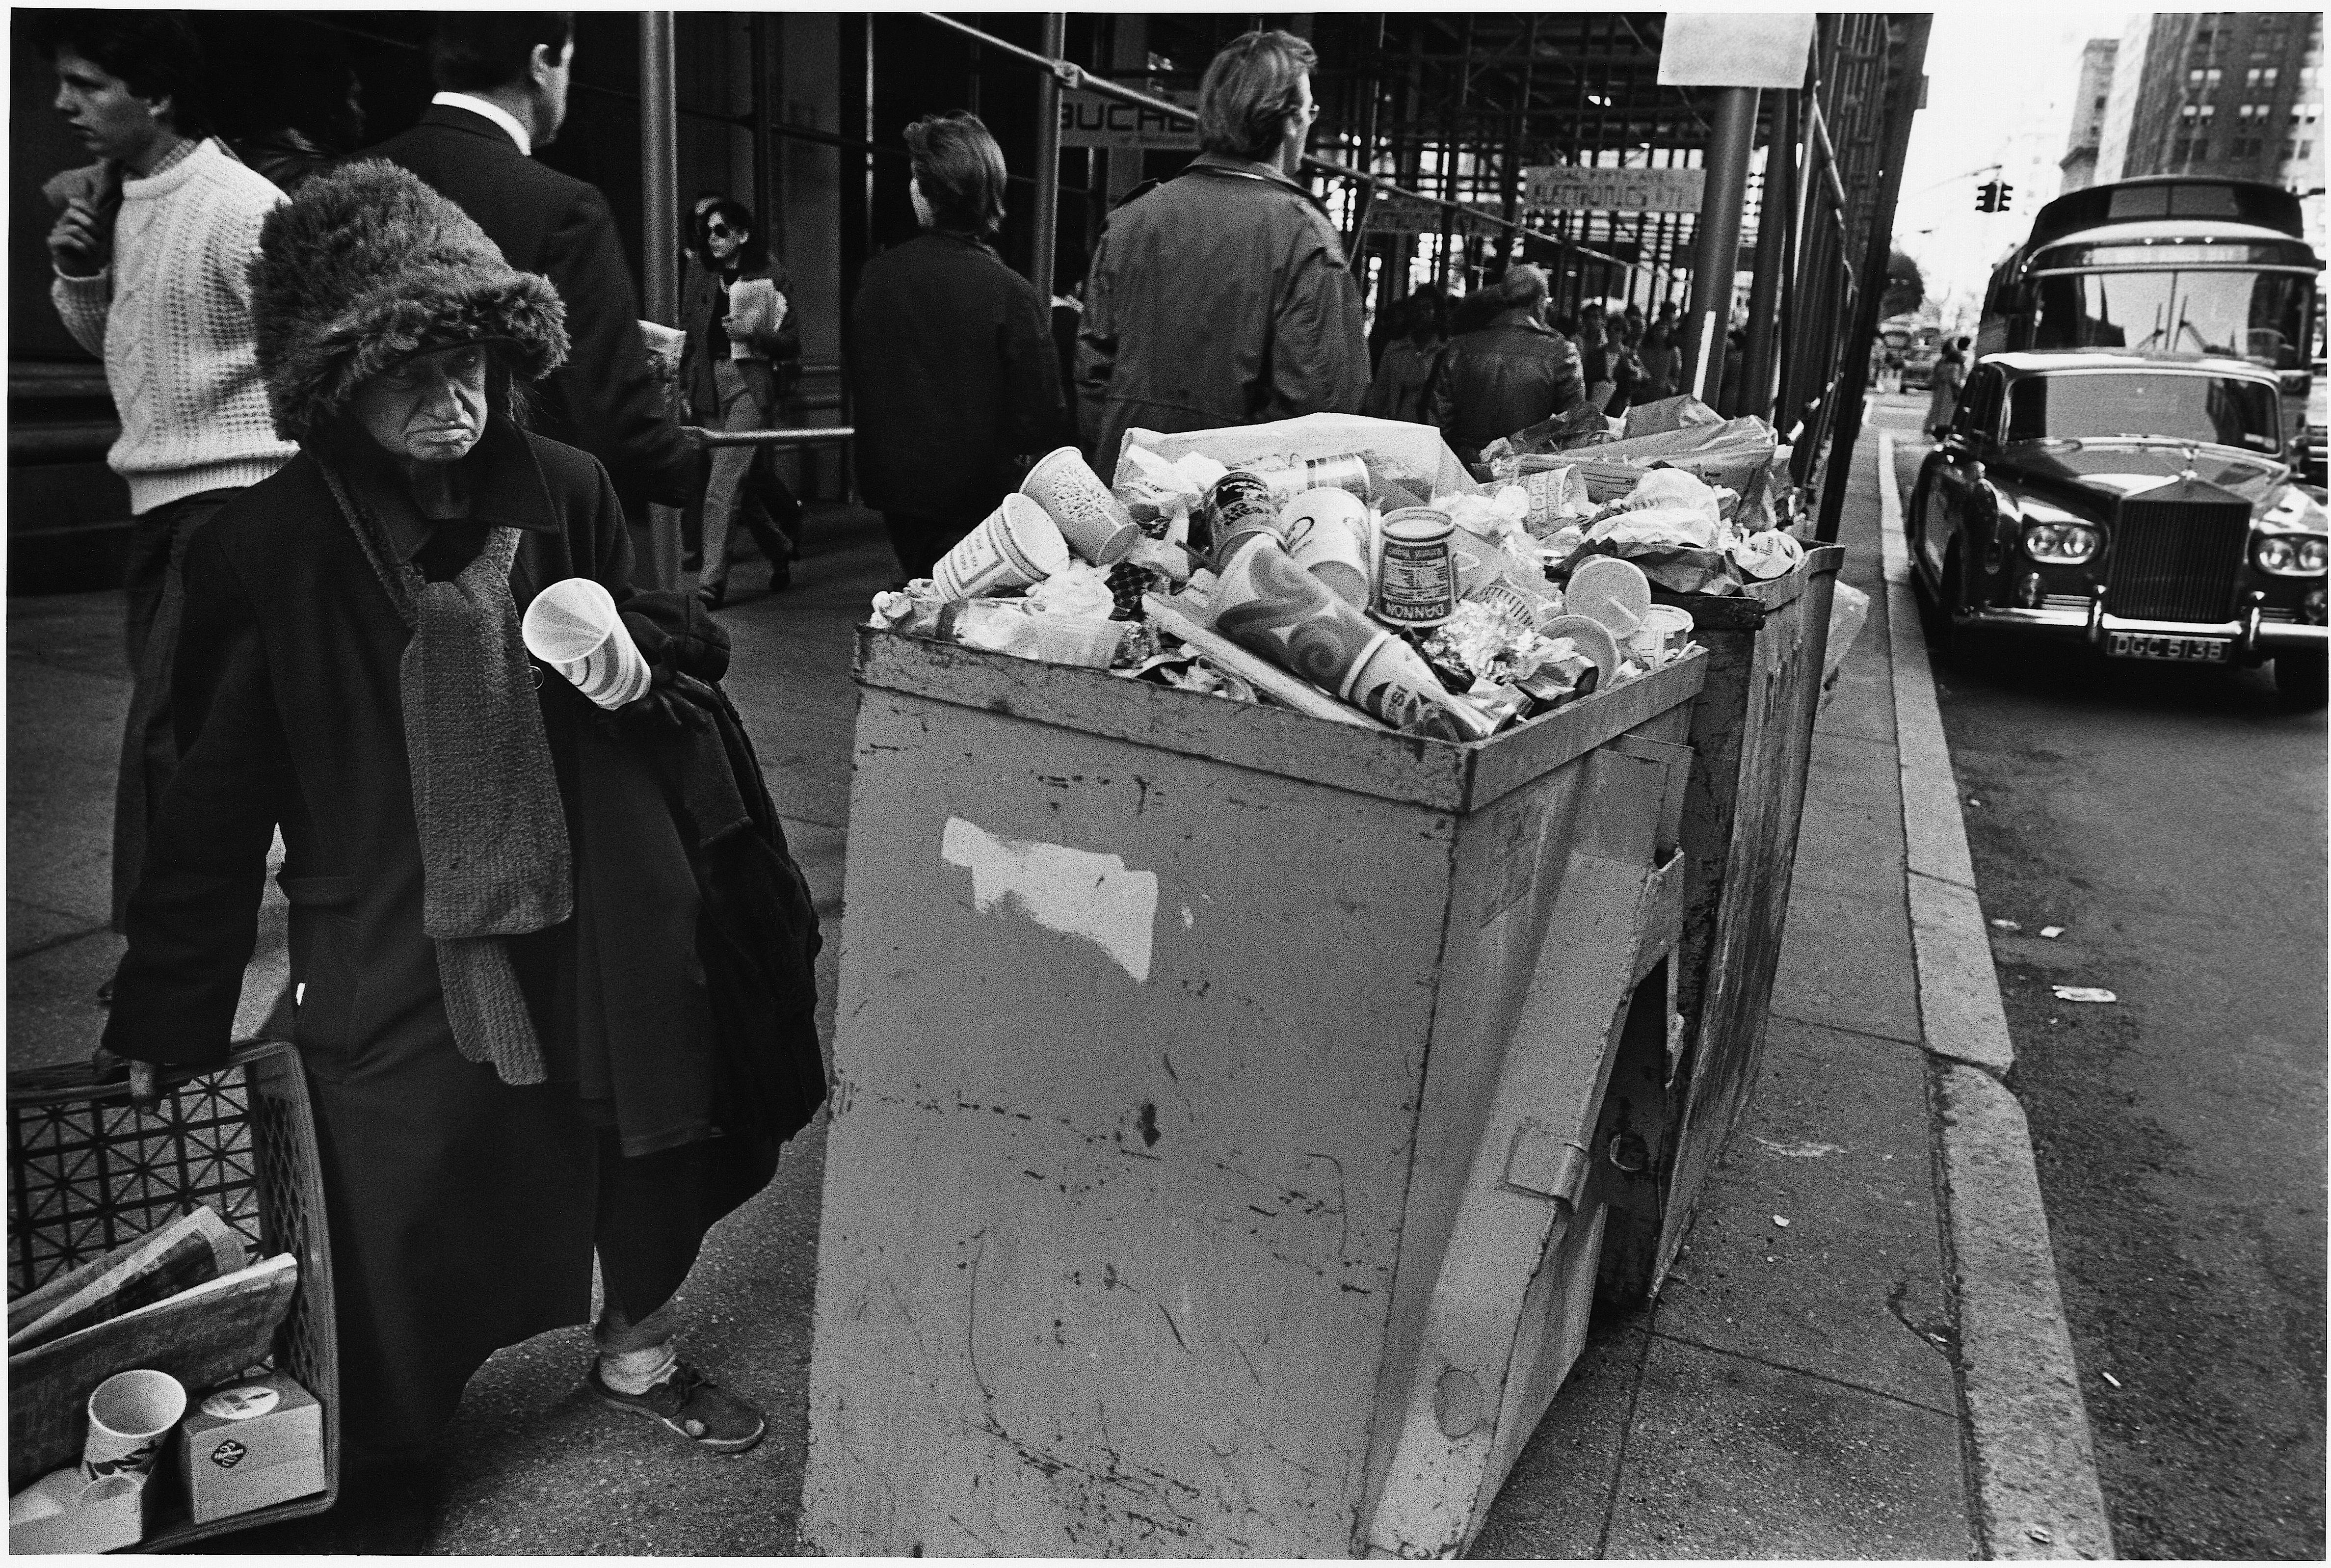 Homeless woman and rolls, 1982 Richard Sandler Photography